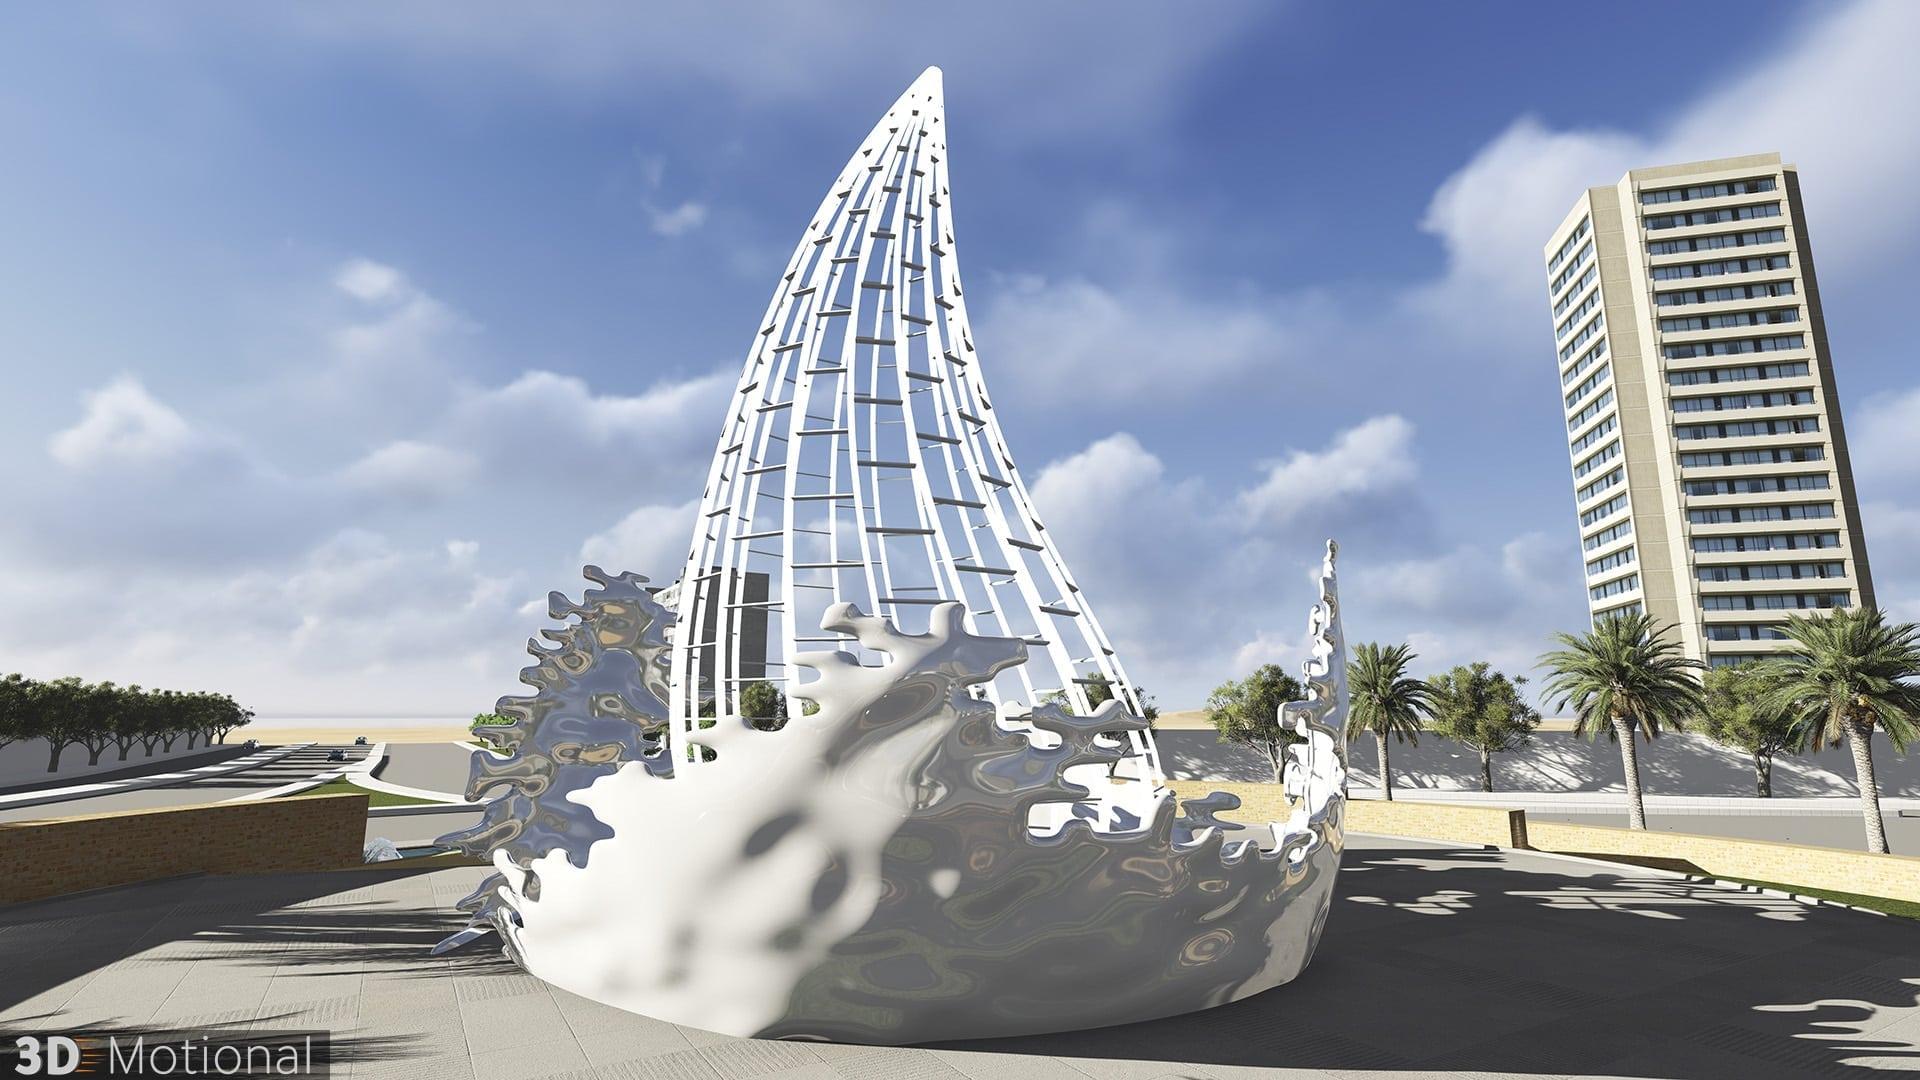 Al Fozan-Roundabout-khobar (5)